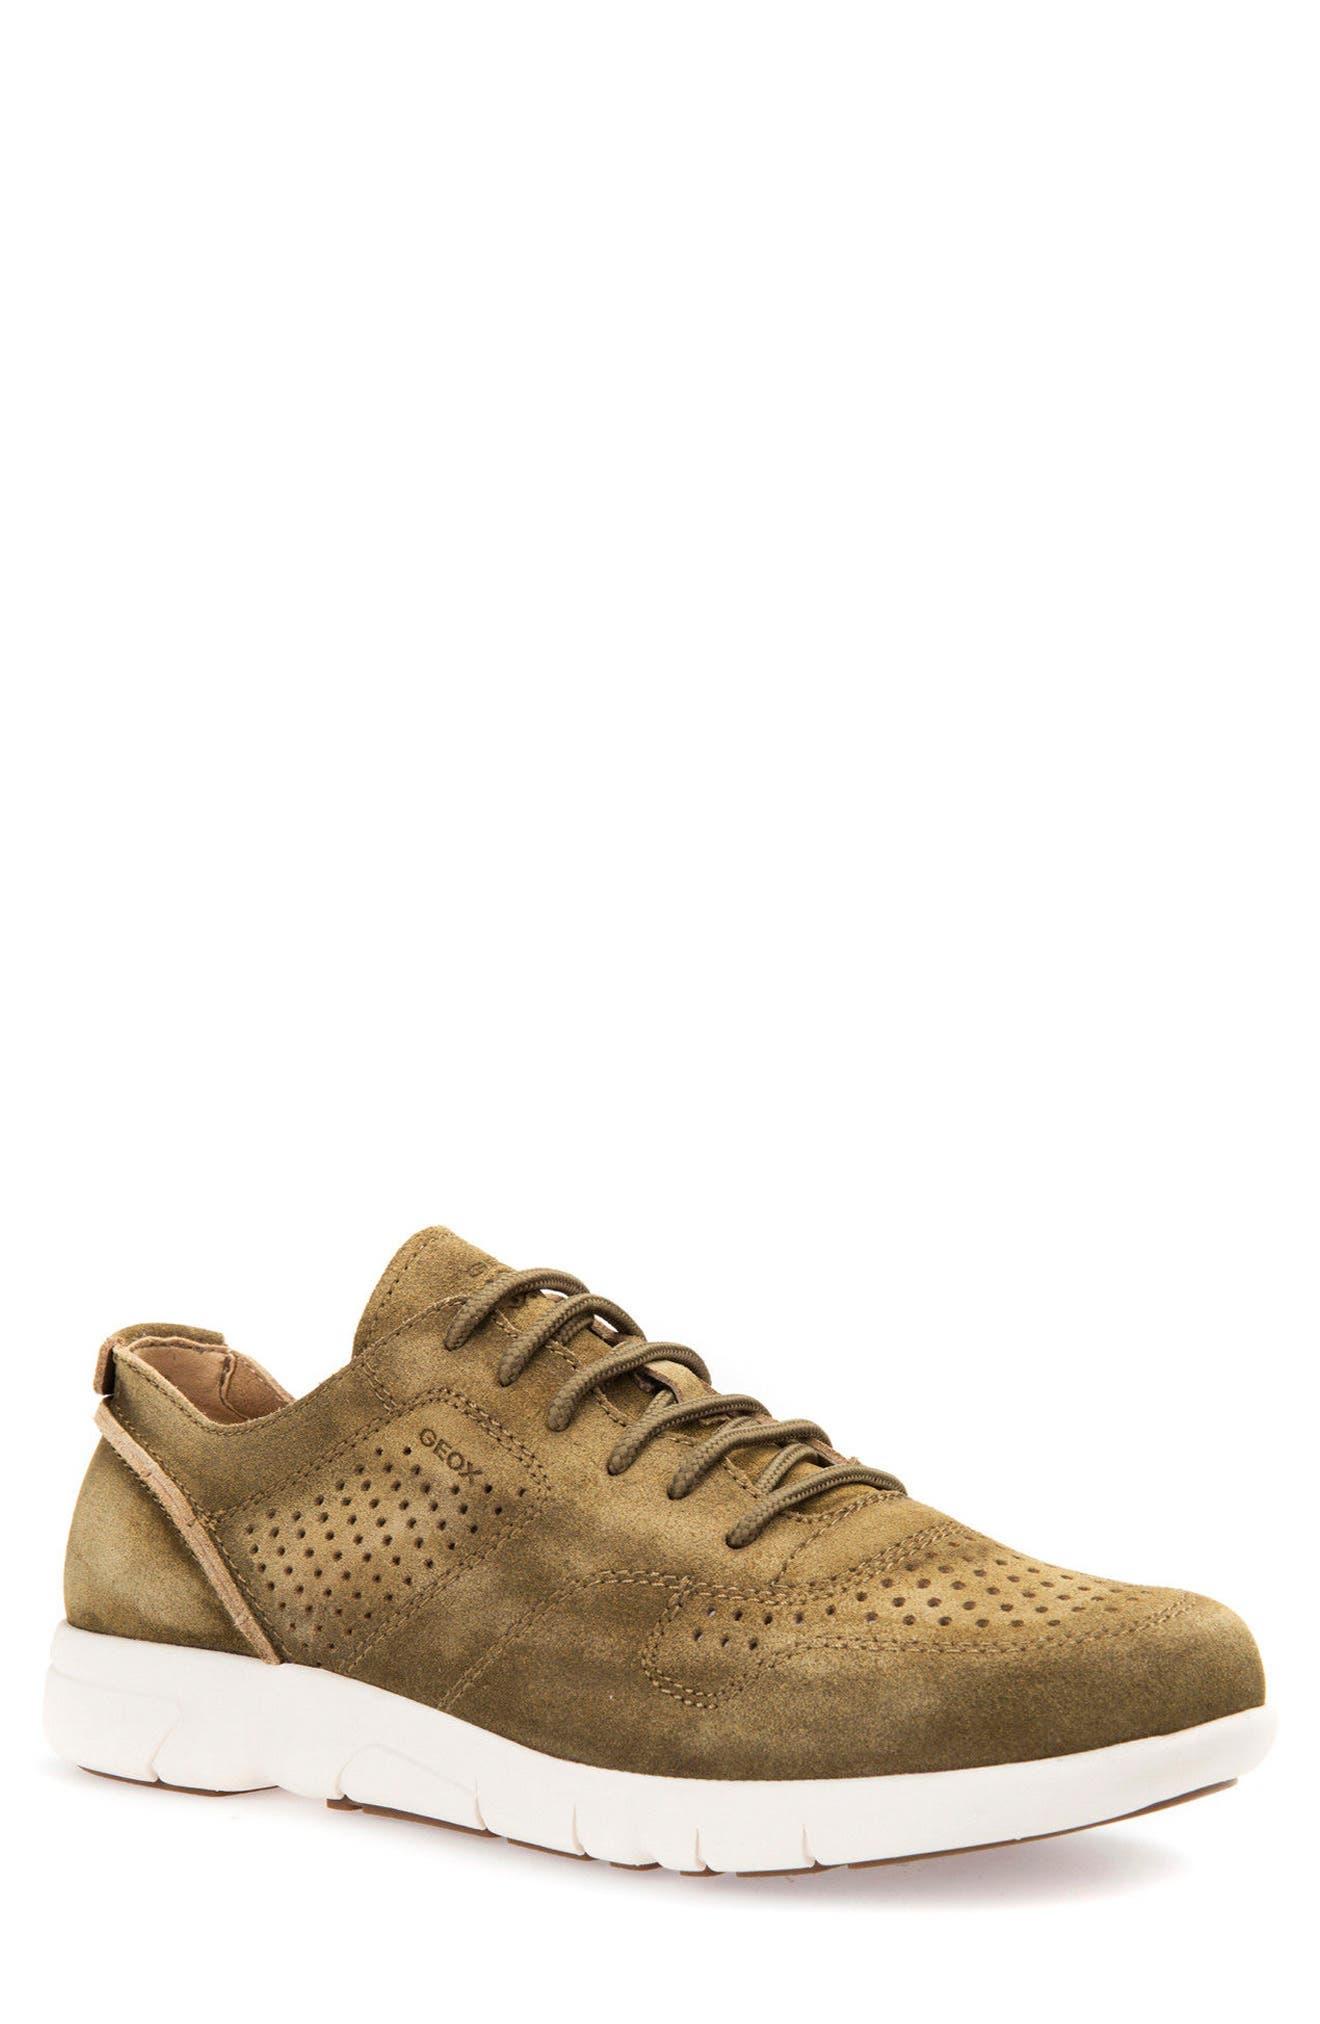 Geox Brattley 2 Perforated Sneaker (Men)